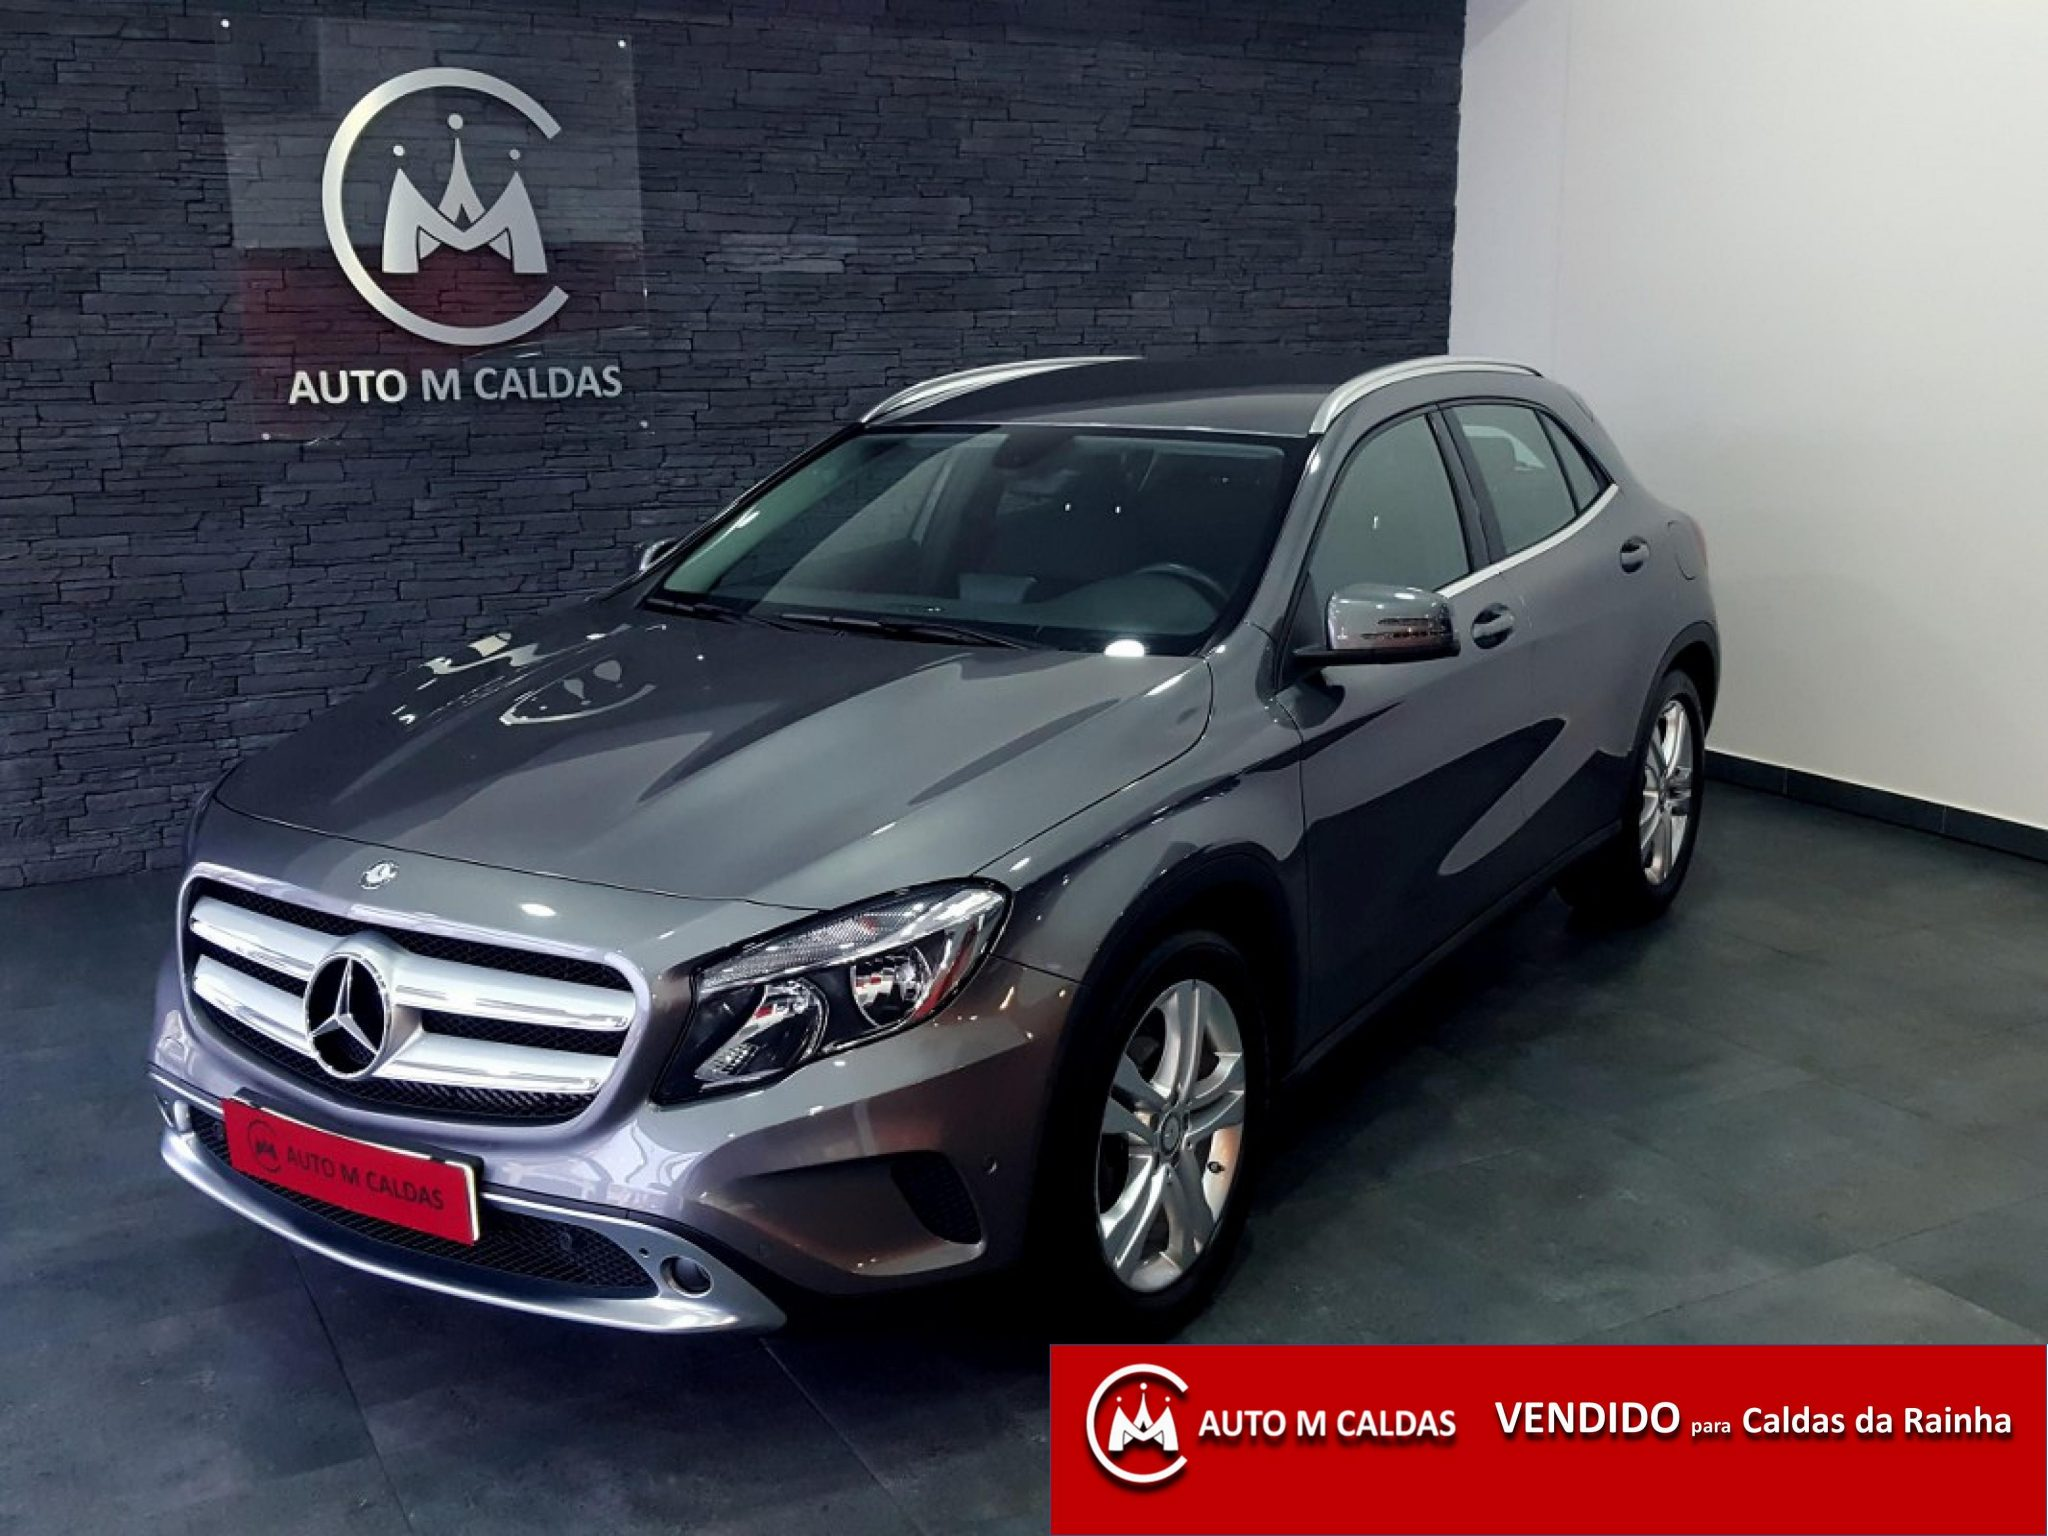 Mercedes benz gla 180 cdi urban aut auto m caldas for Mercedes benz gla 180